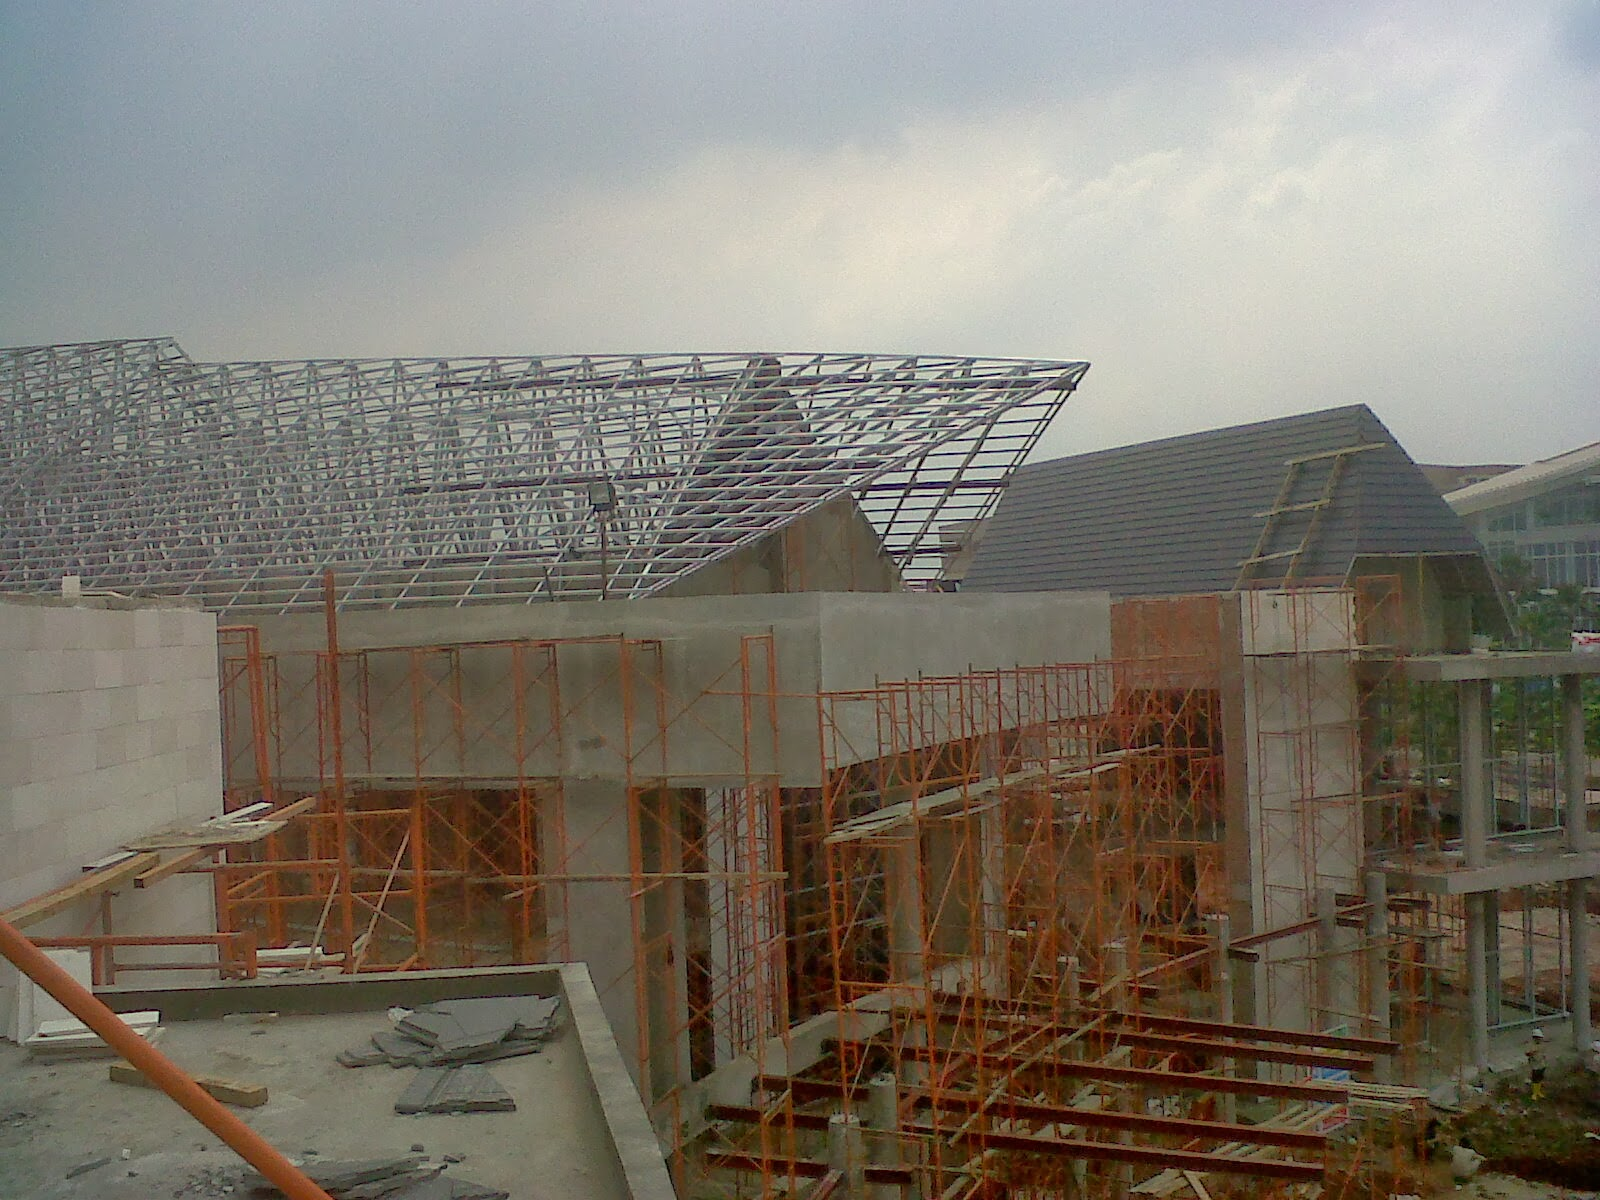 Atap Baja Ringan Di Pekanbaru Gambar Model Rumah | Interior